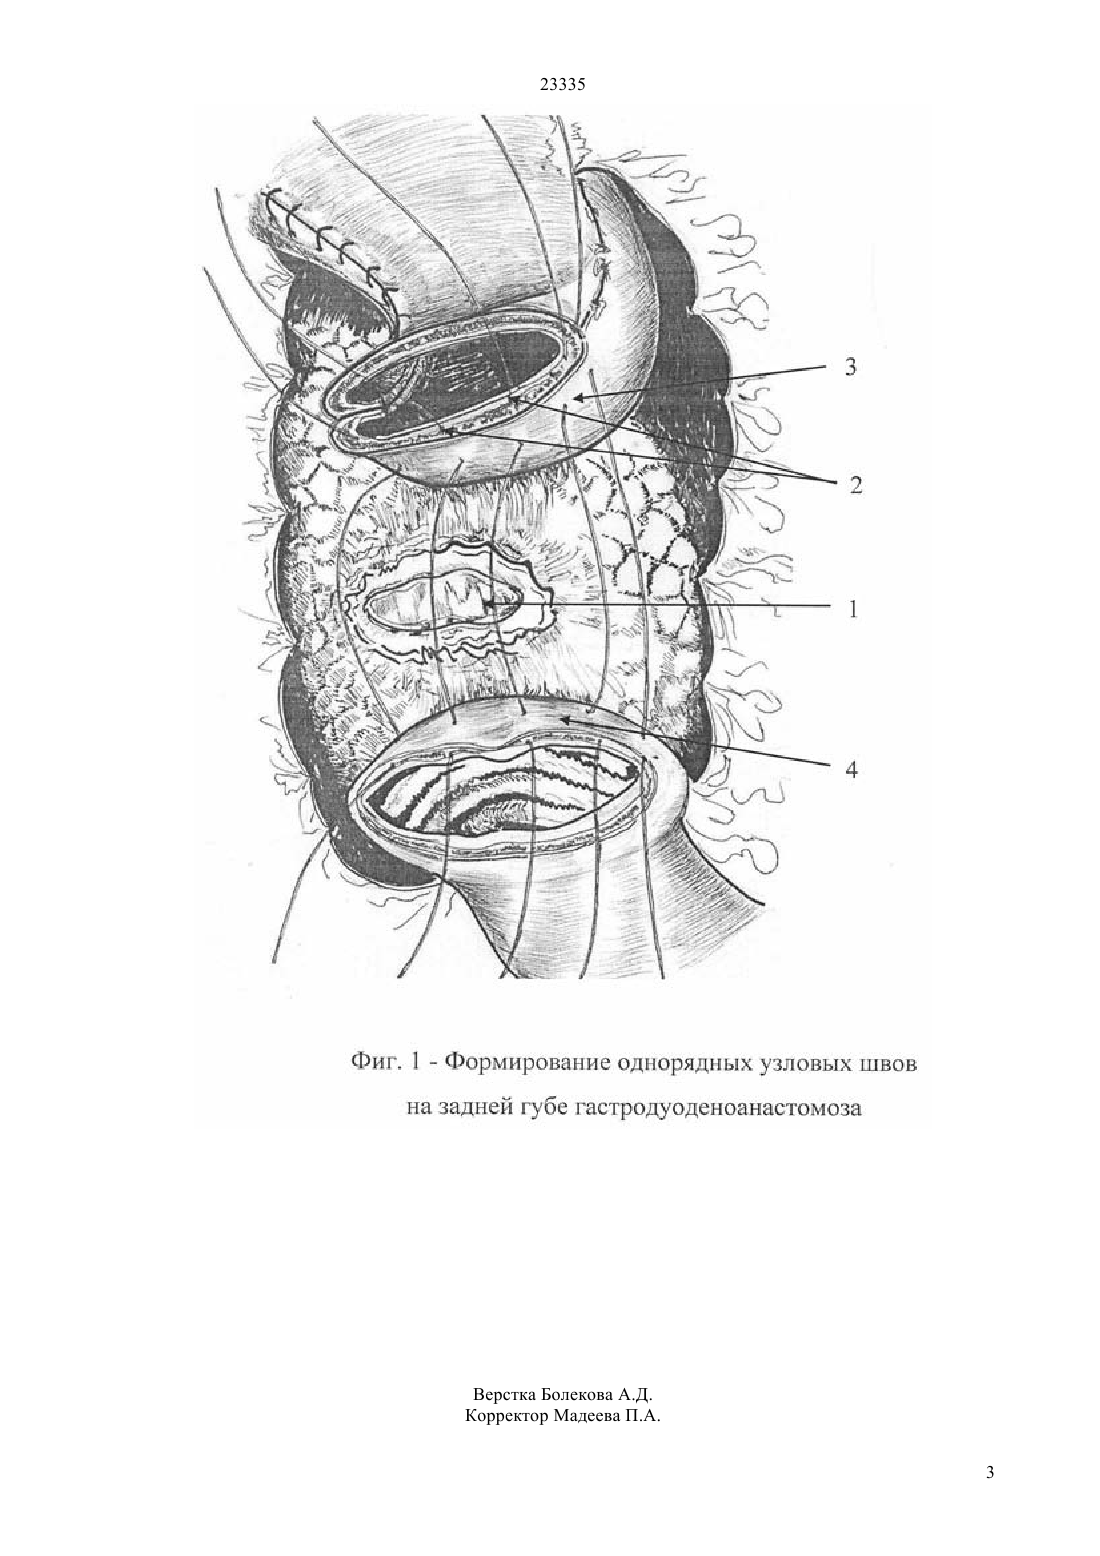 Пенетрирующая язва желудка и двенадцатиперстной кишки